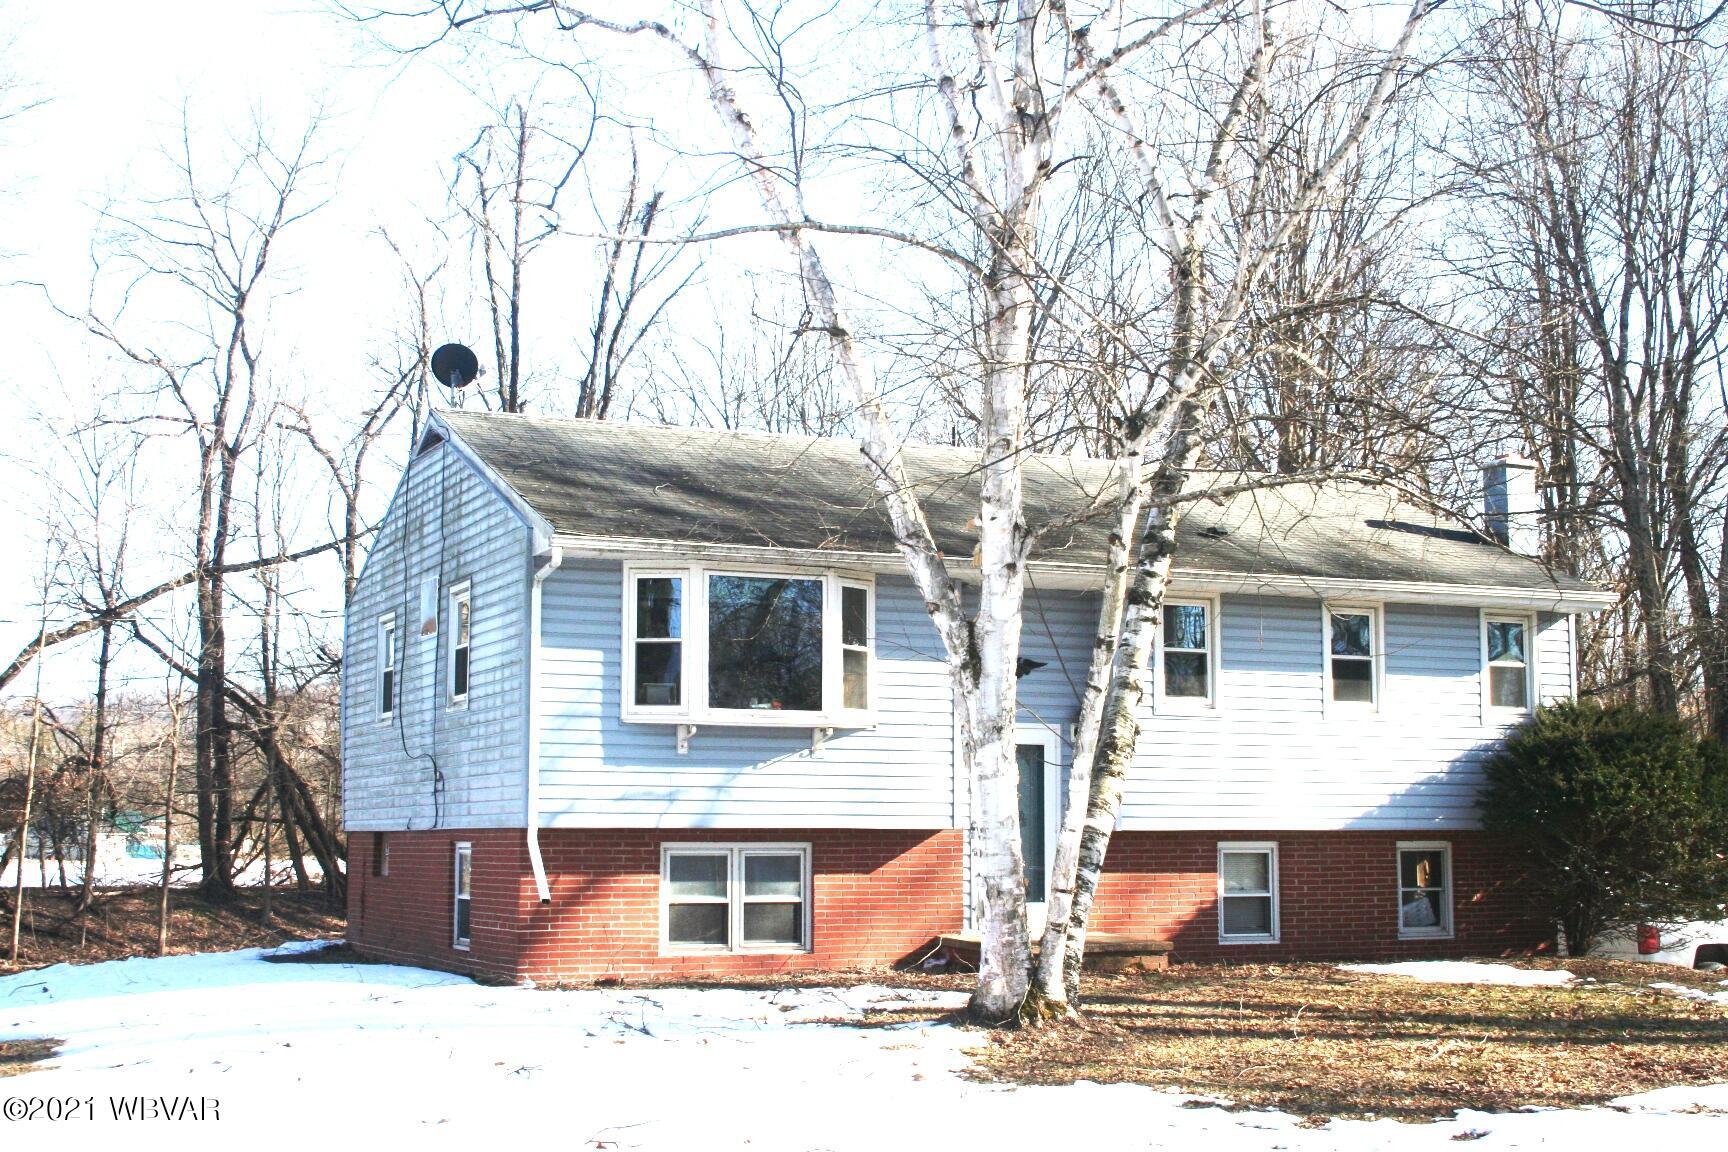 44 RTE. 118 HIGHWAY, Hughesville, PA 17737, 4 Bedrooms Bedrooms, ,1.75 BathroomsBathrooms,Residential,For sale,RTE. 118,WB-92024